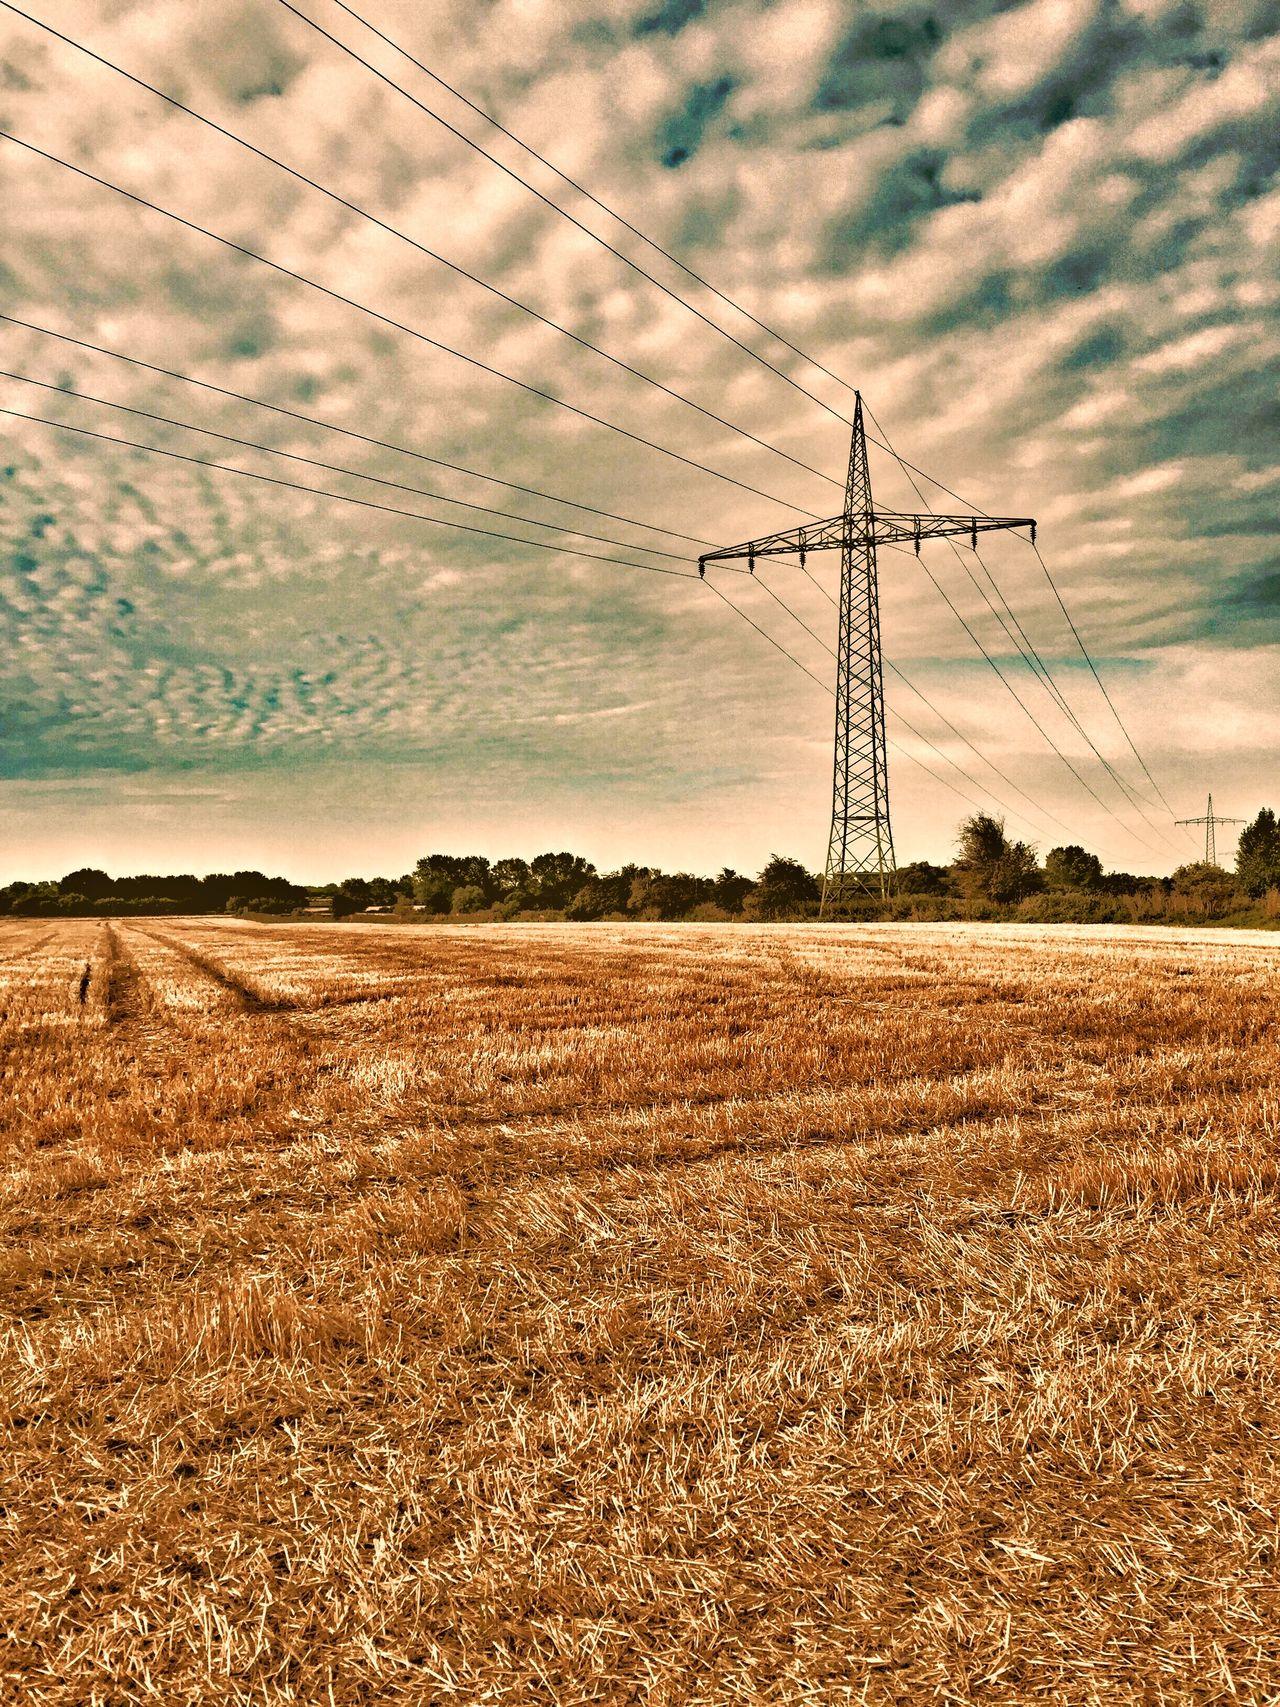 Homeland Sky Nature NEM Landscapes Rural Scenes Farmland Sunset #sun #clouds #skylovers #sky #nature #beautifulinnature #naturalbeauty #photography #landscape